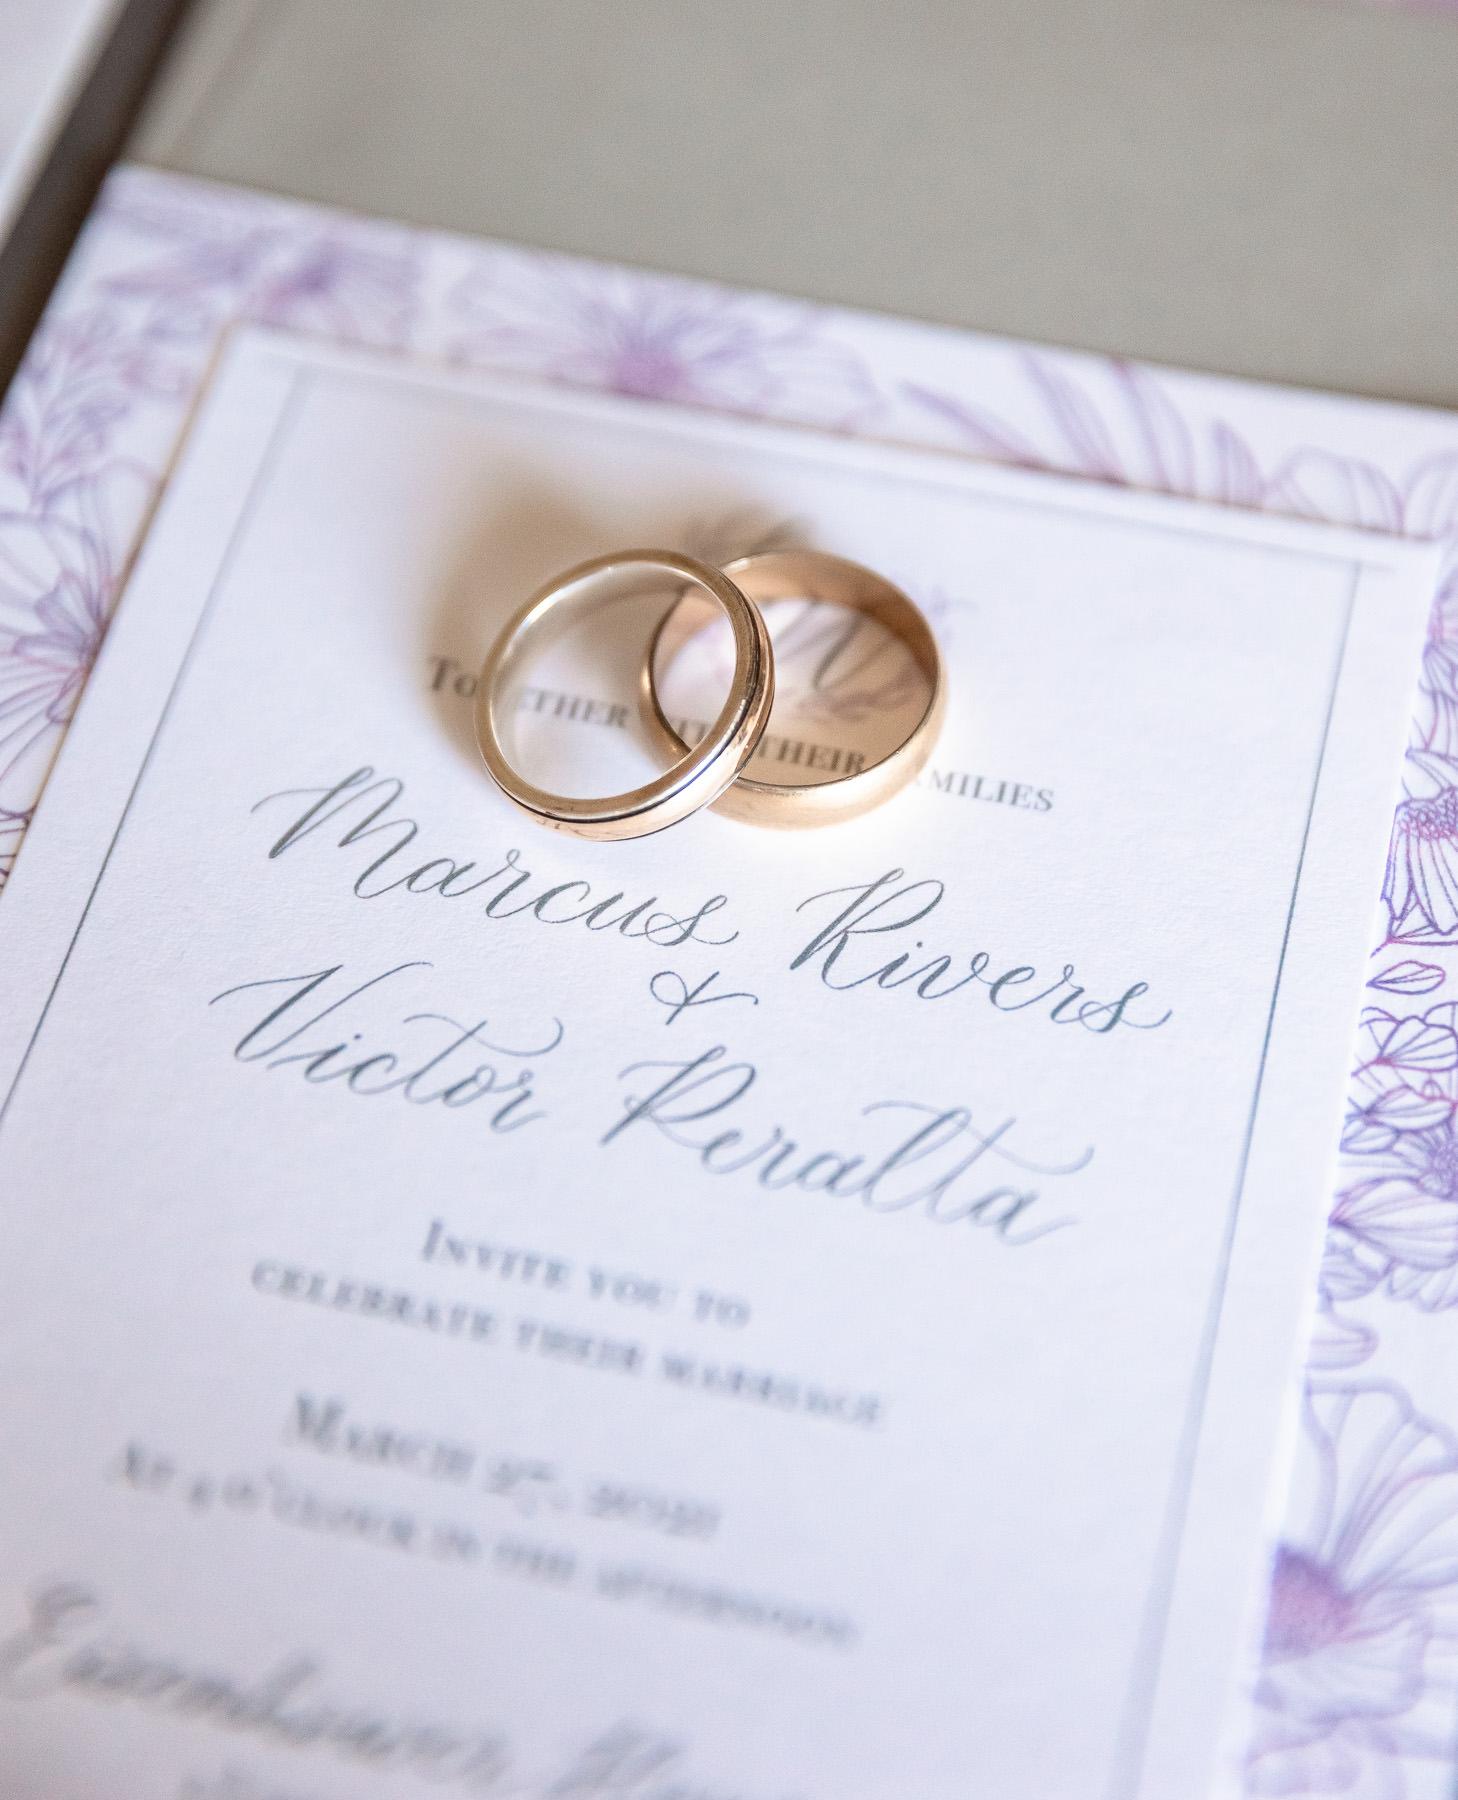 Eisenhower House, Newport, Rhode Island, Tracy Jenkins Photography, wedding, LGBTQ+, LGBT, Gay, Inclusive, Photography, Wedding photography, invitation, rings, lavender grey